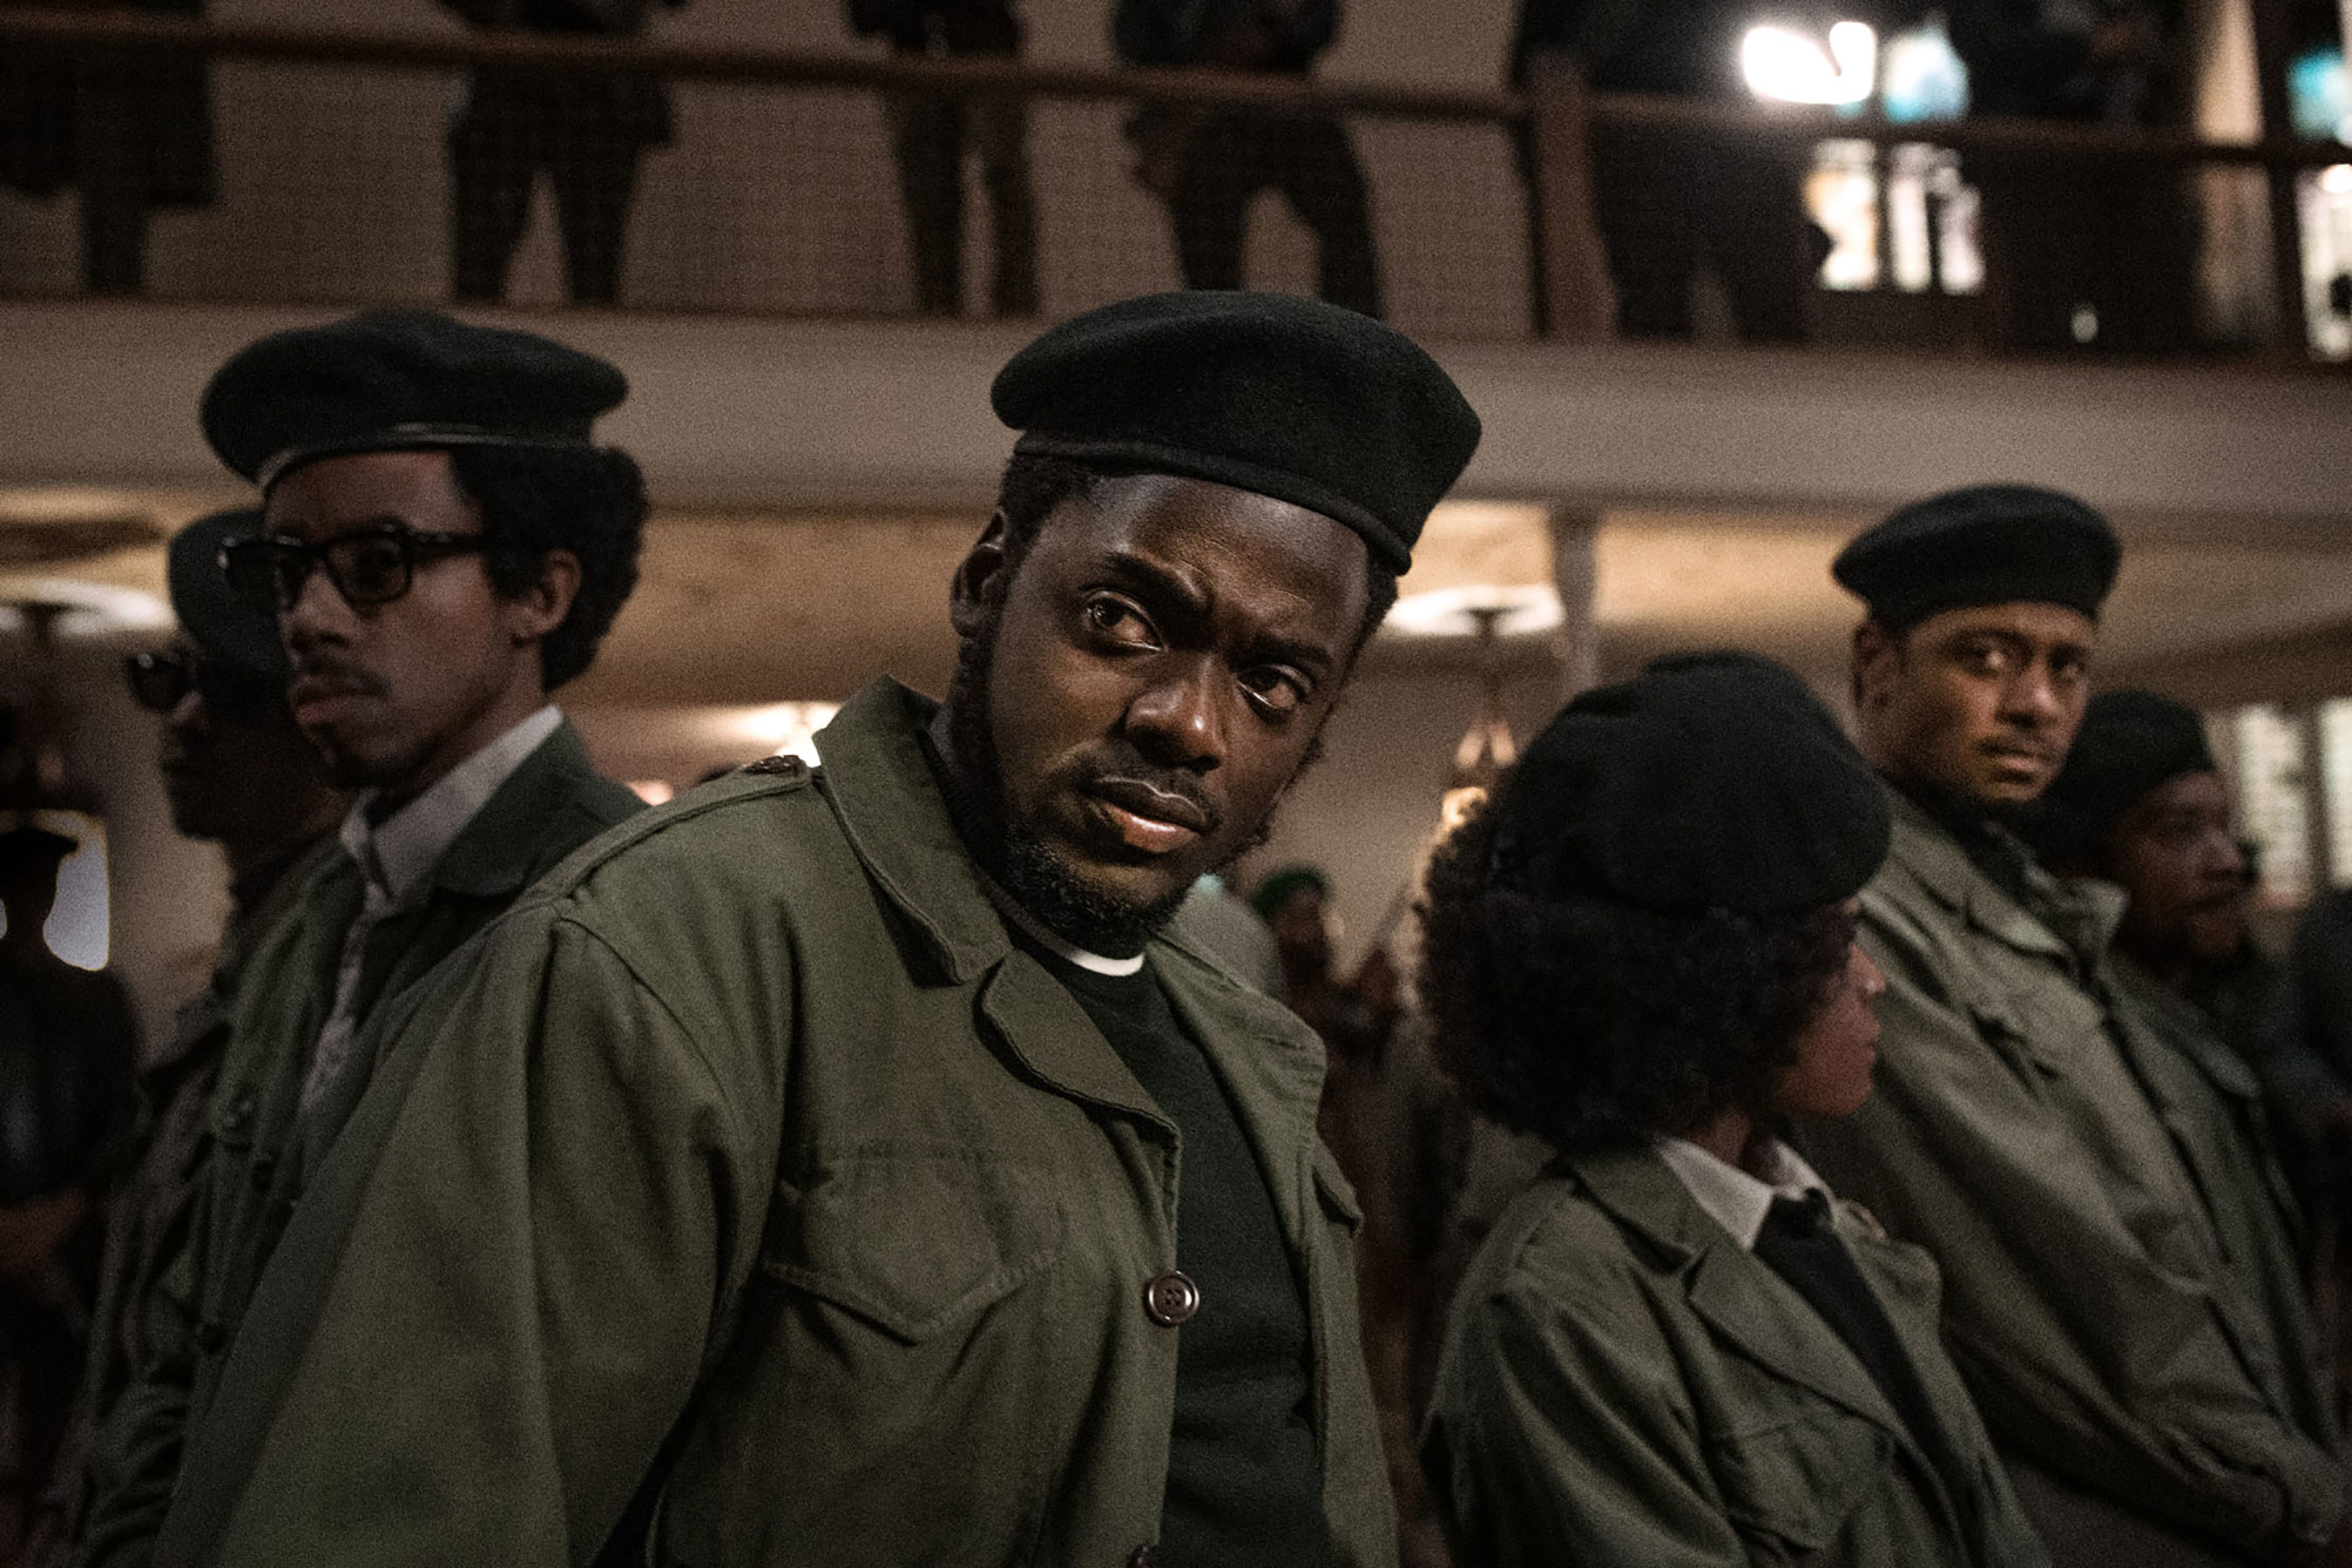 Daniel as Fred Hampton giving a speech in Judas and the Black Messiah